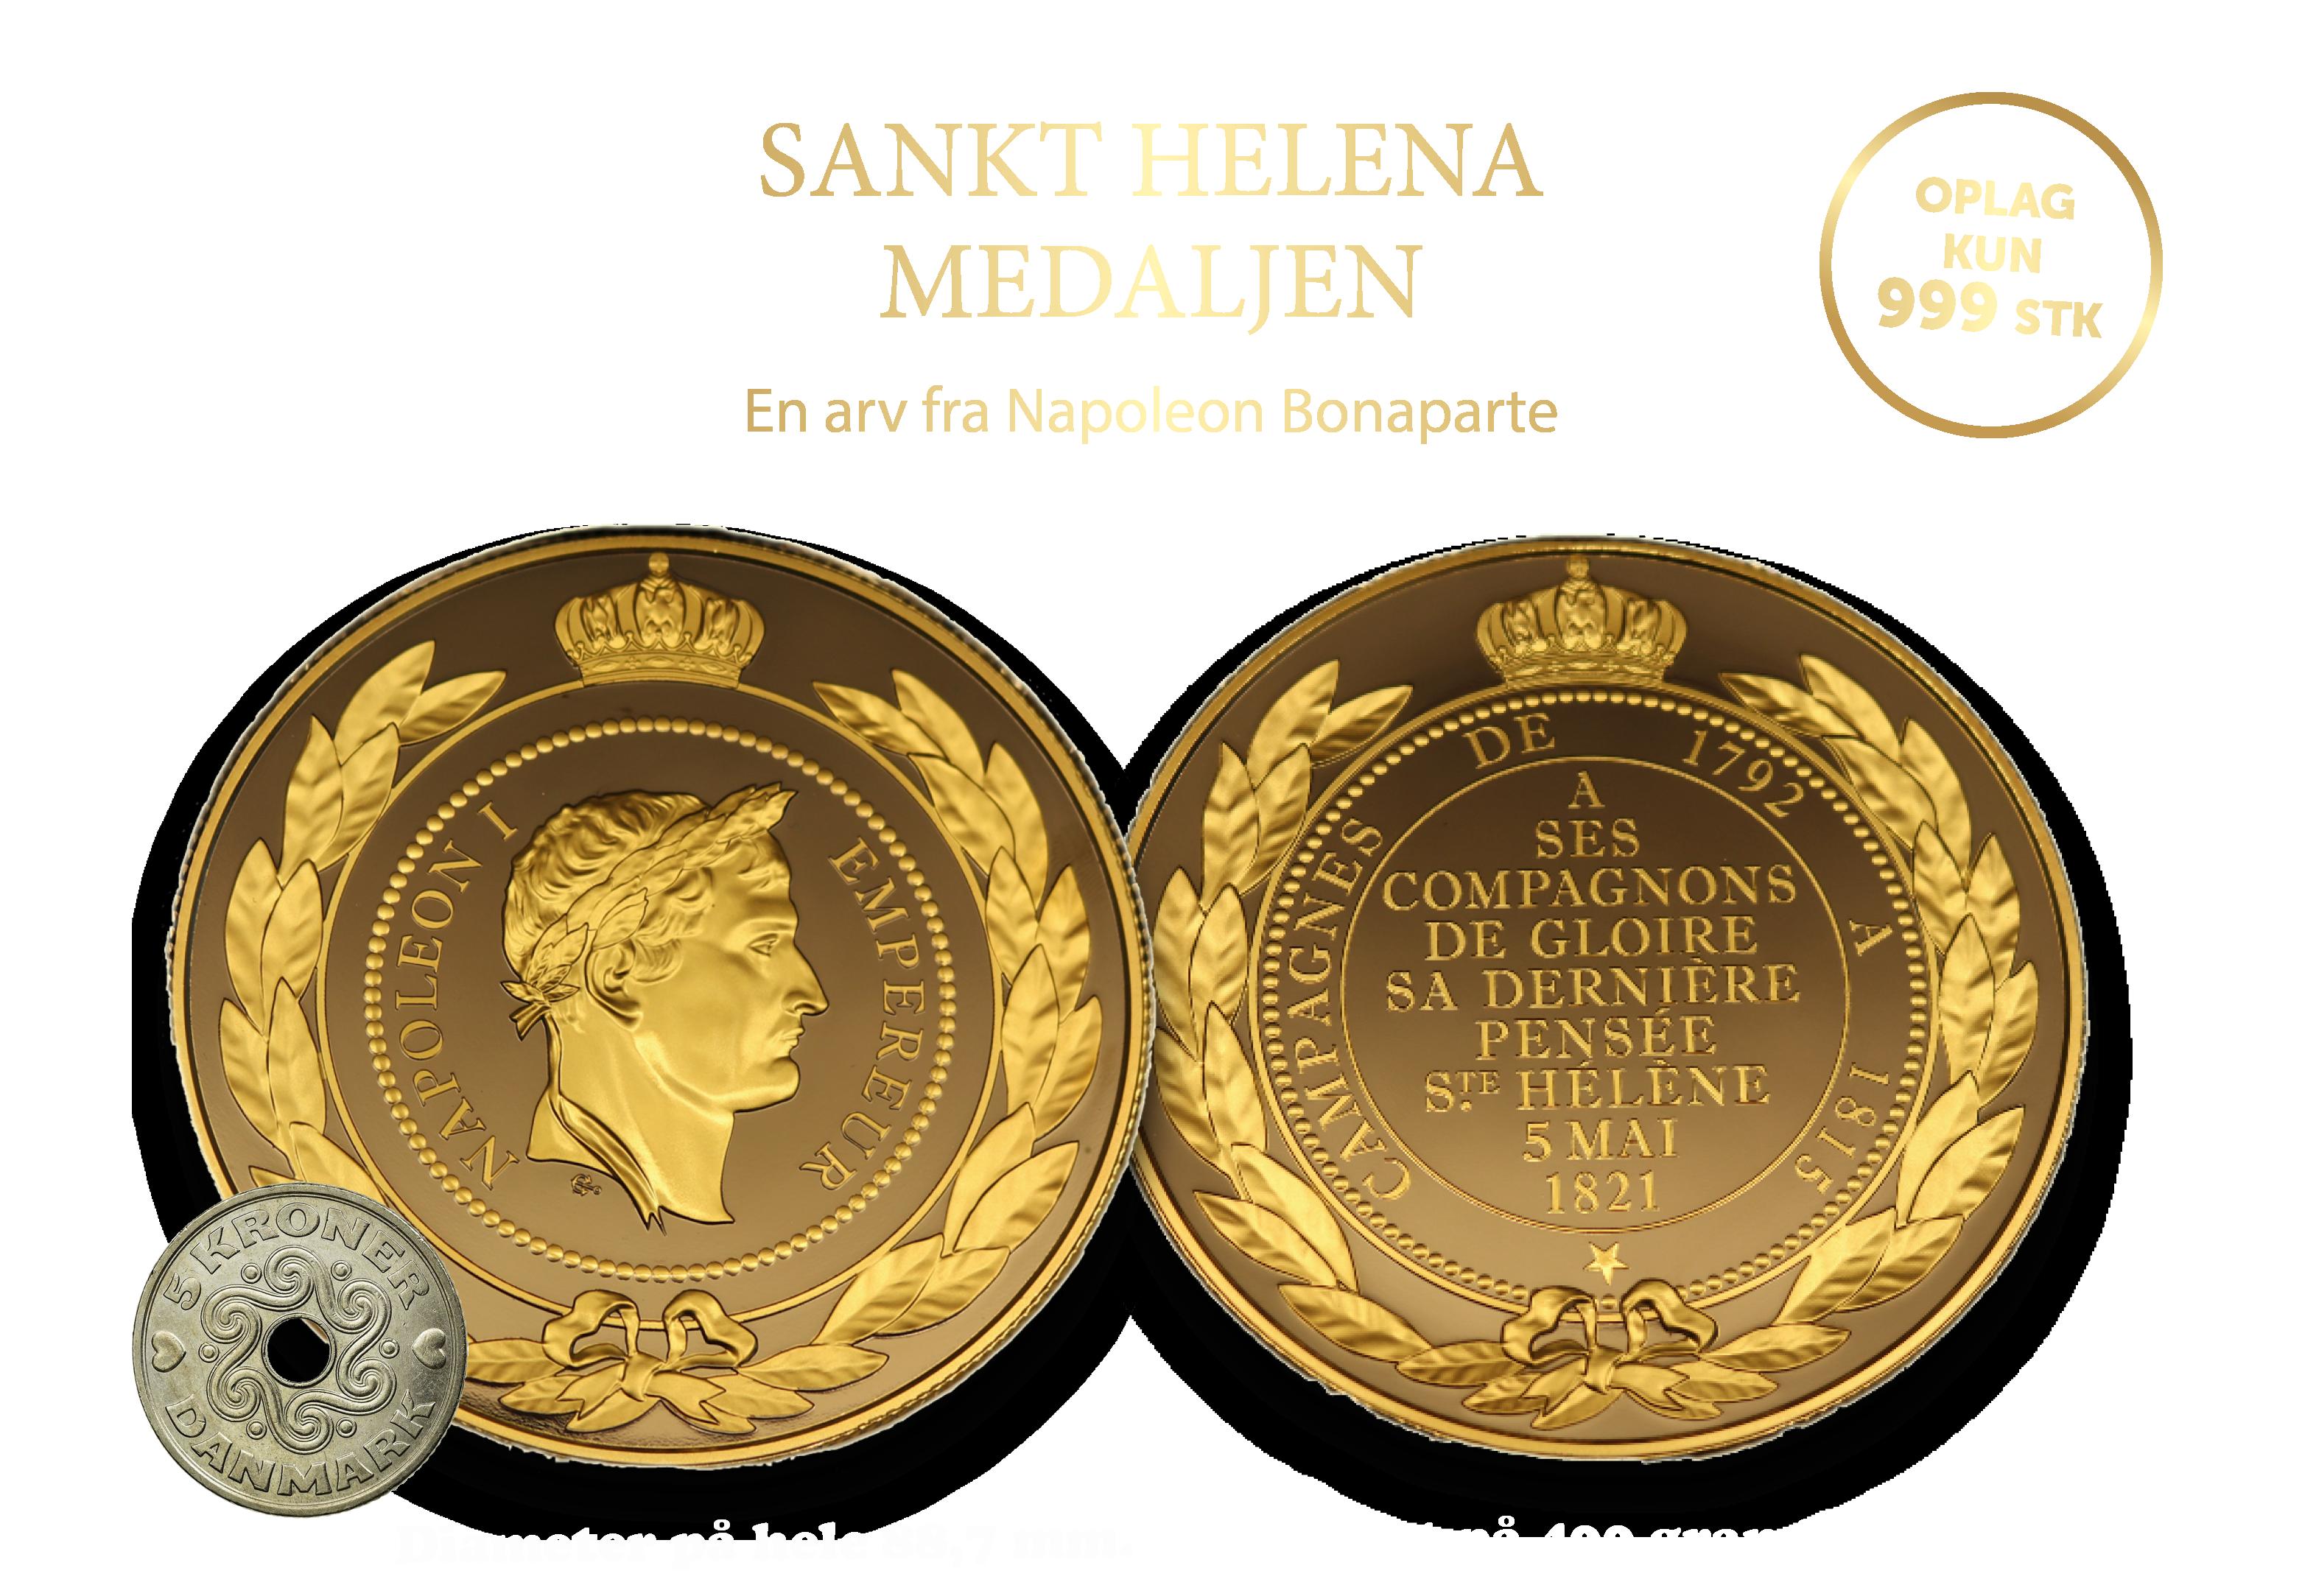 Sankt Helena Medaljen - En arv fra Napoleon Bonaparte